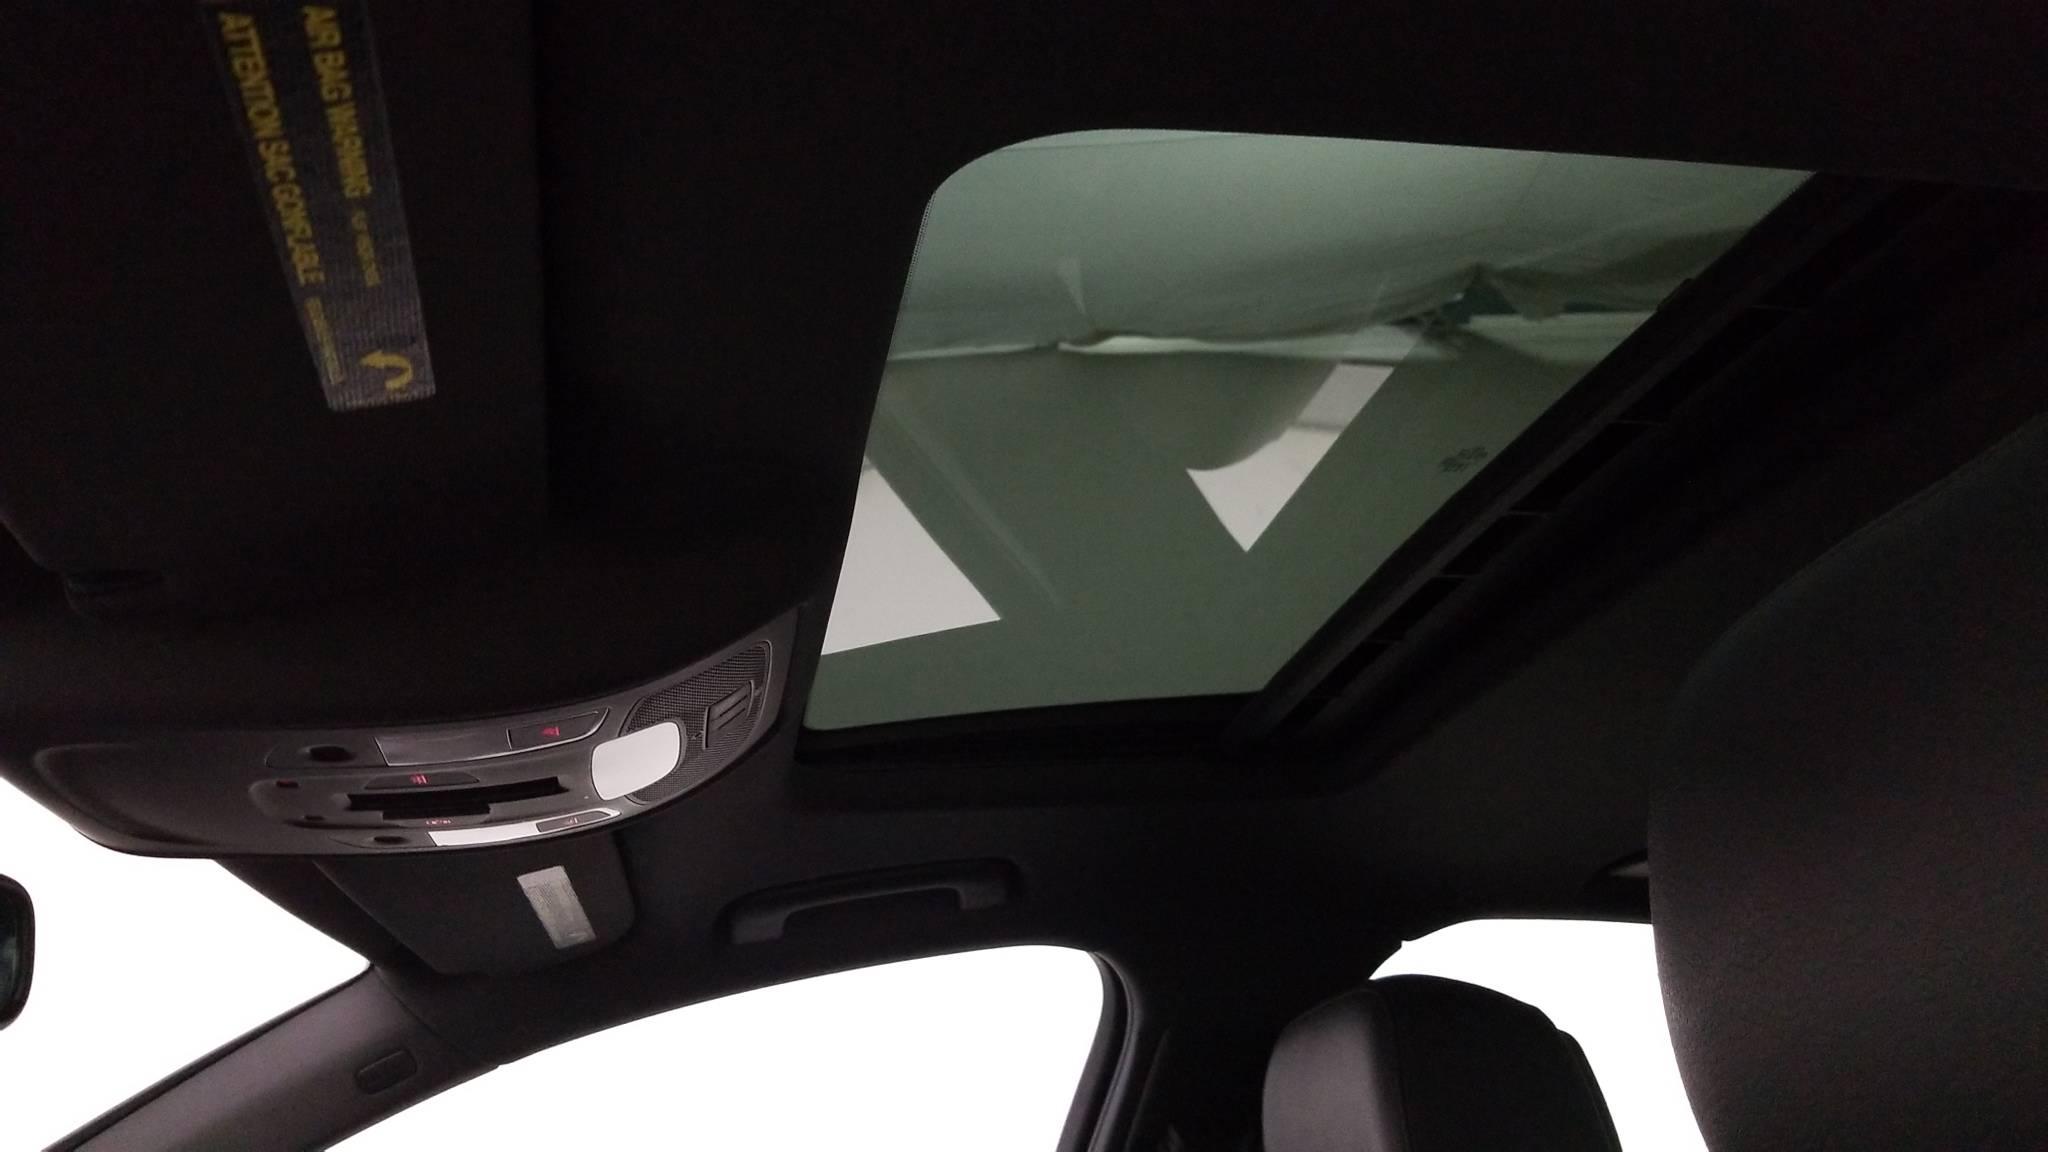 Pre-Owned 2014 Audi A6 3.0T Premium Plus